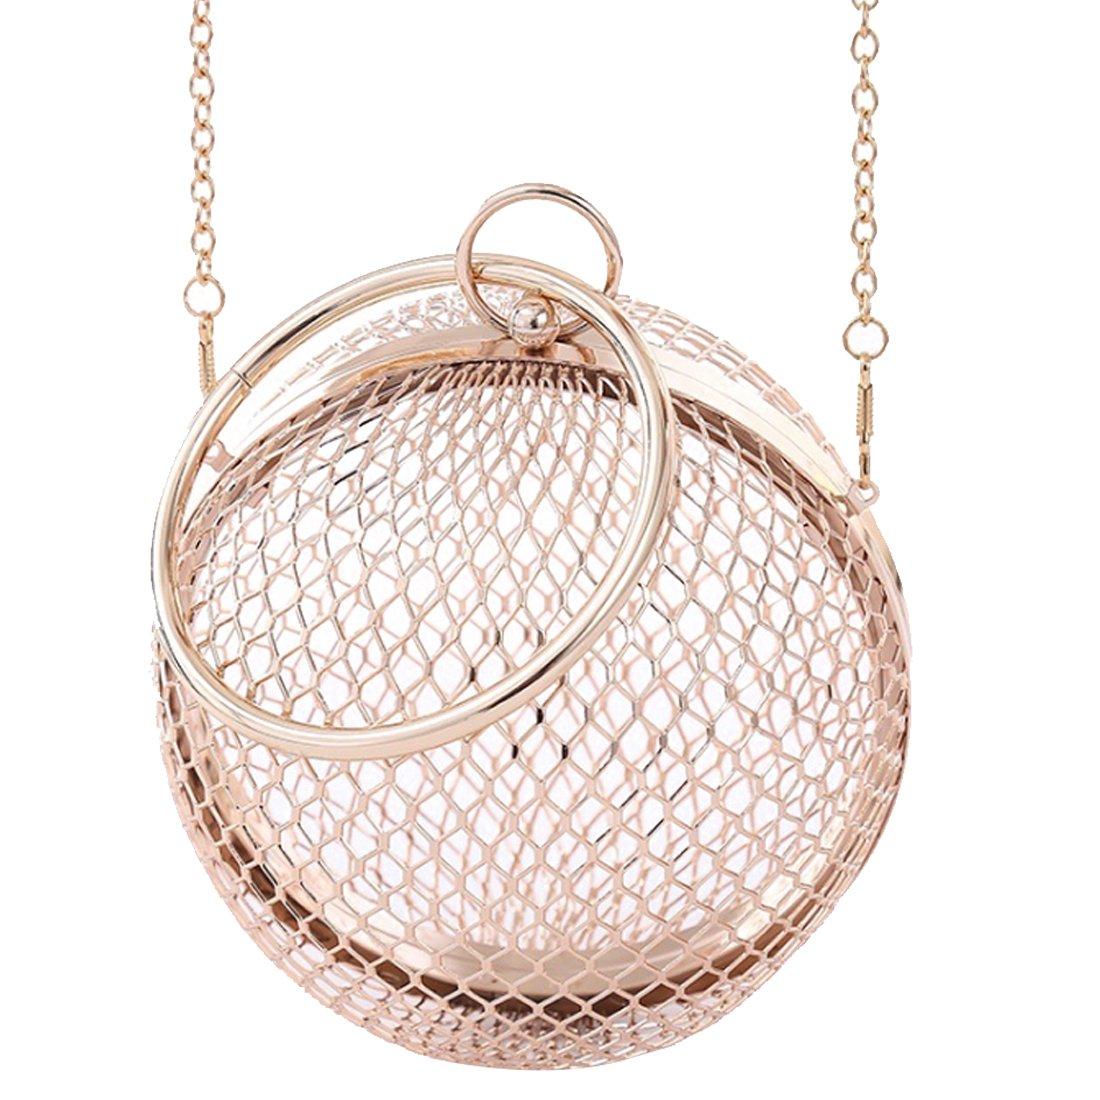 Evening Bag, YIFAN Ball shaped Bag Ladies Arcylic Party Purses Clutch Vintage Banquet Handbag 5.9''(Golden)